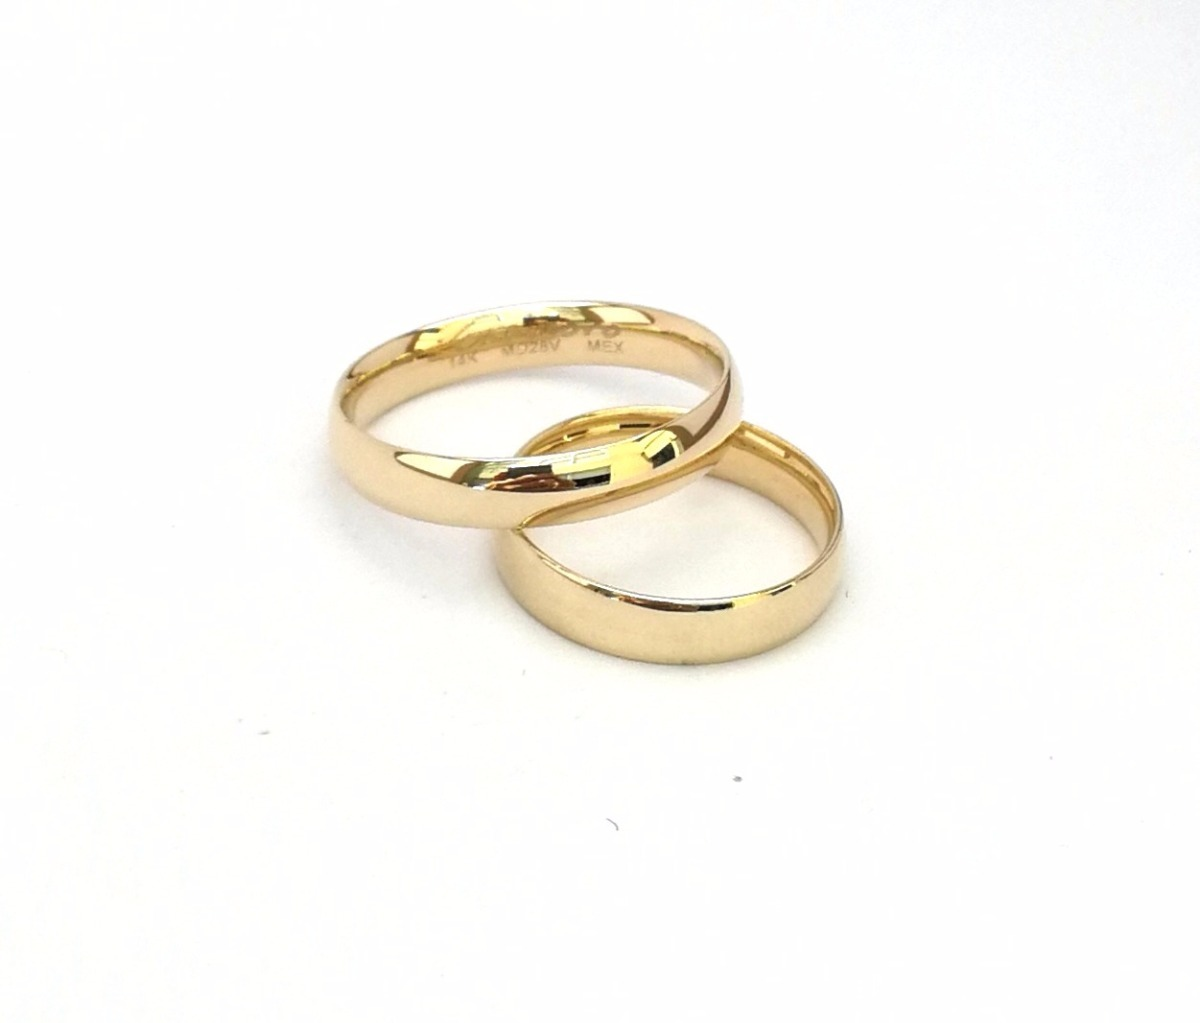 040b21bb3b7 Par Argollas Matrimoniales Confort Oro Macizo 14k 4mm